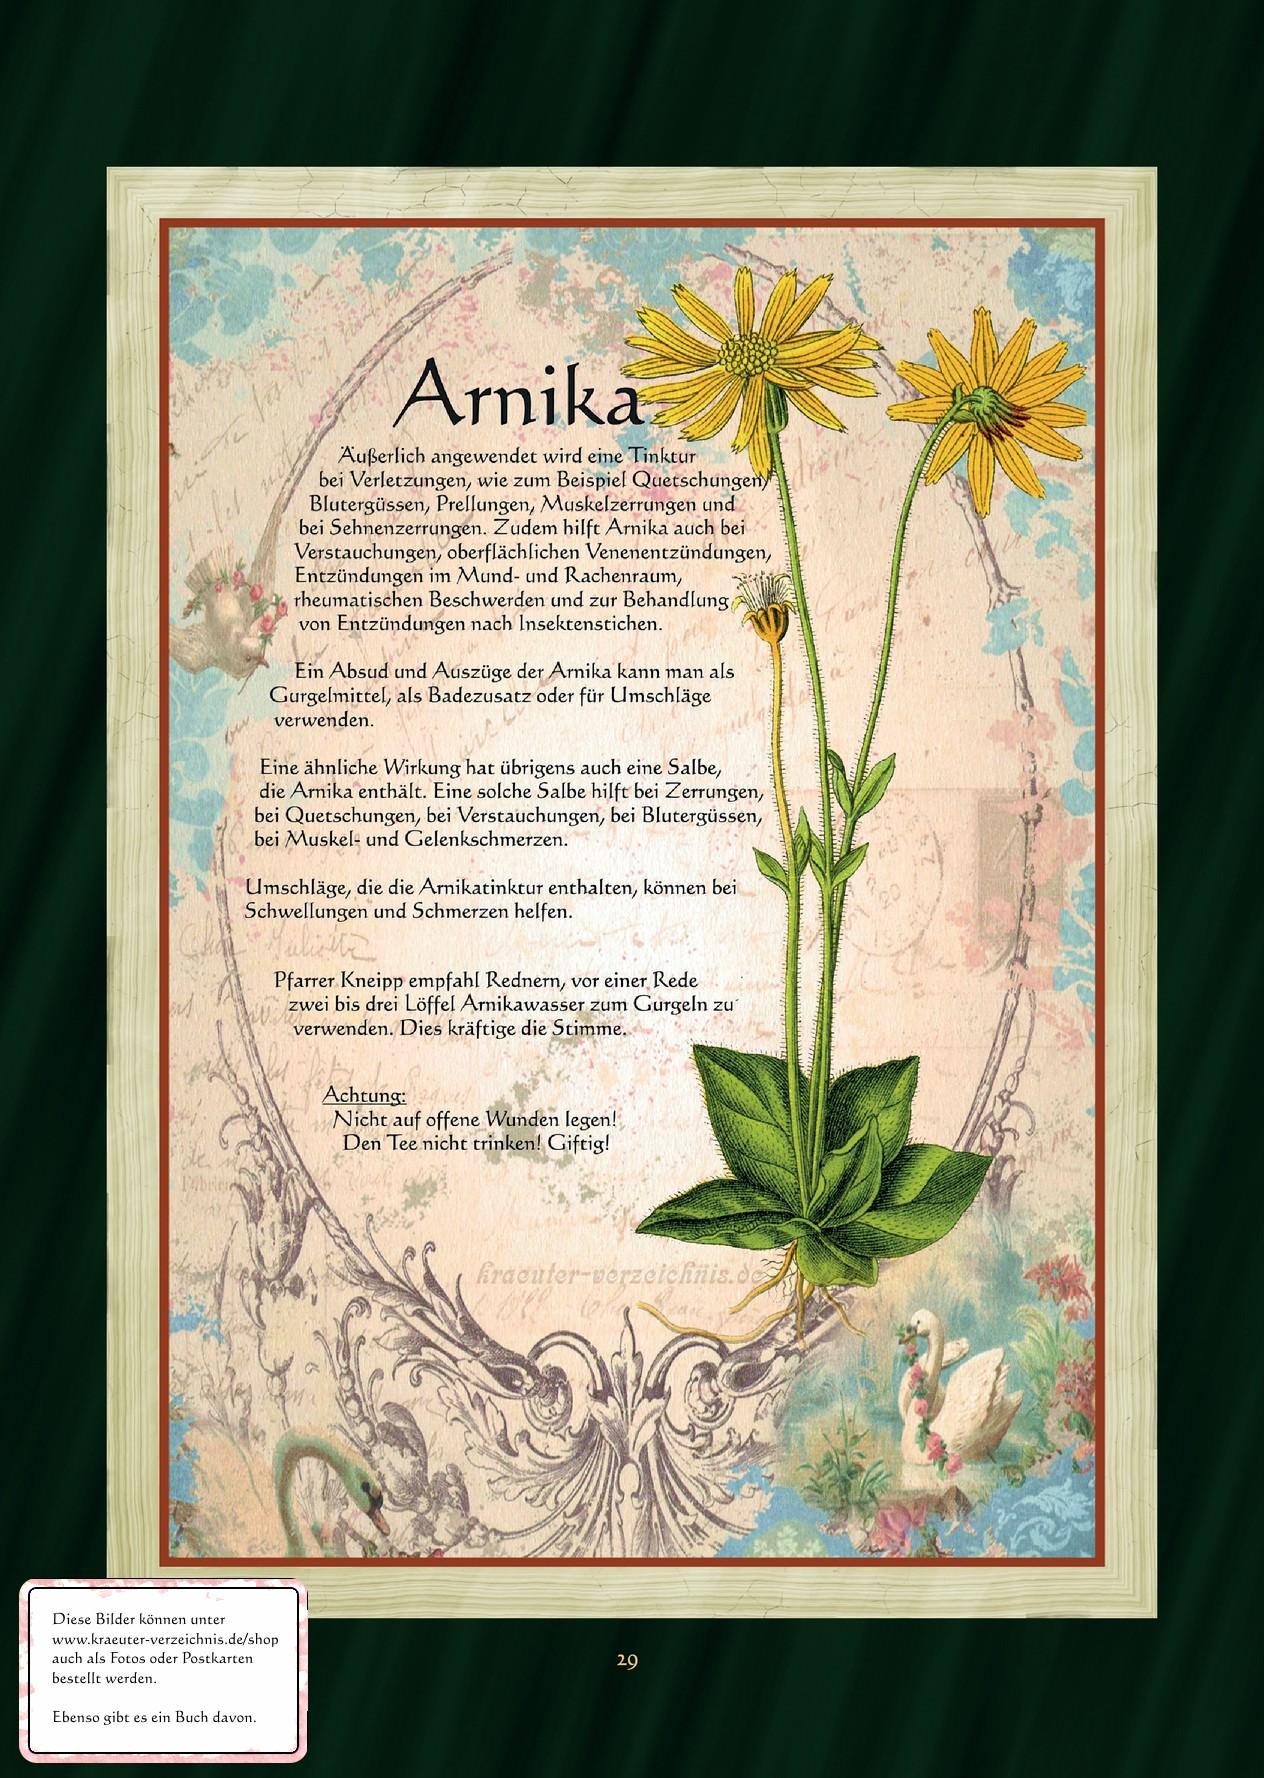 www.arnica.com.au pdf